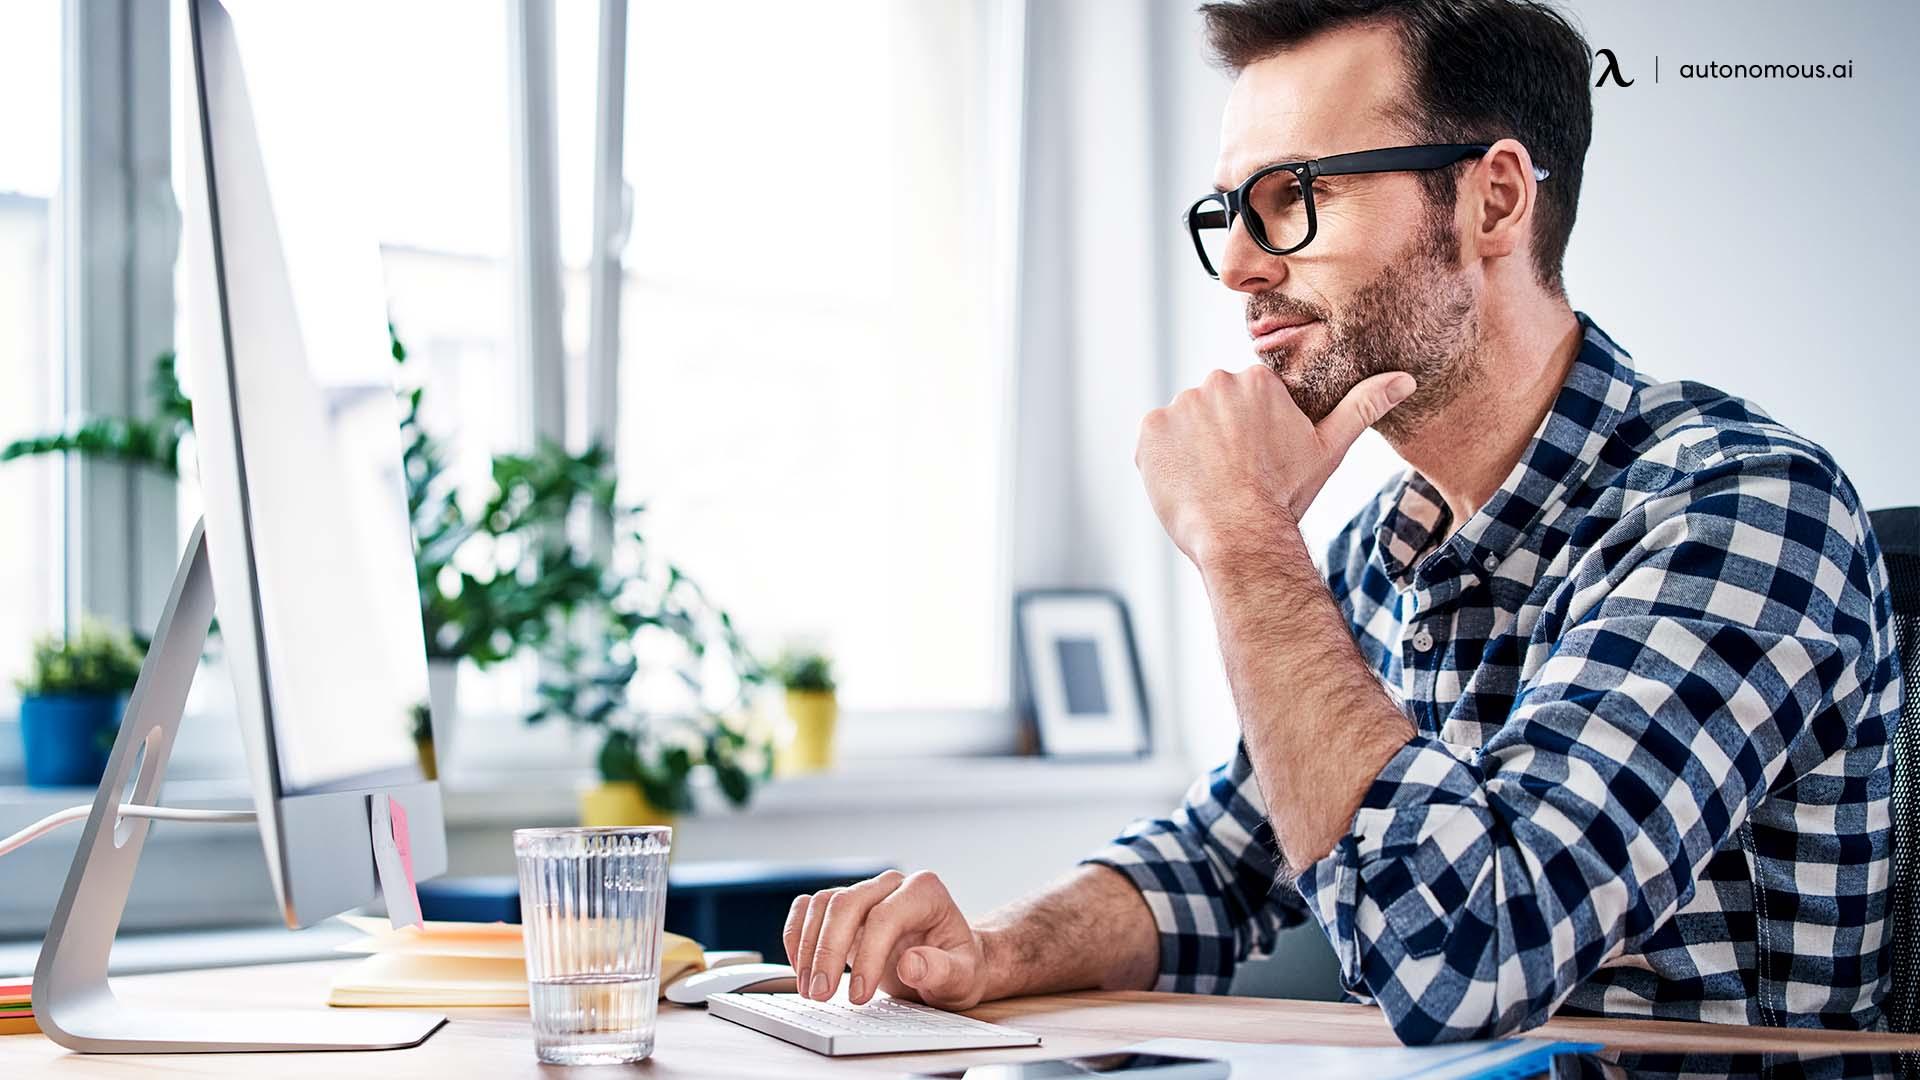 Maintain focus at work